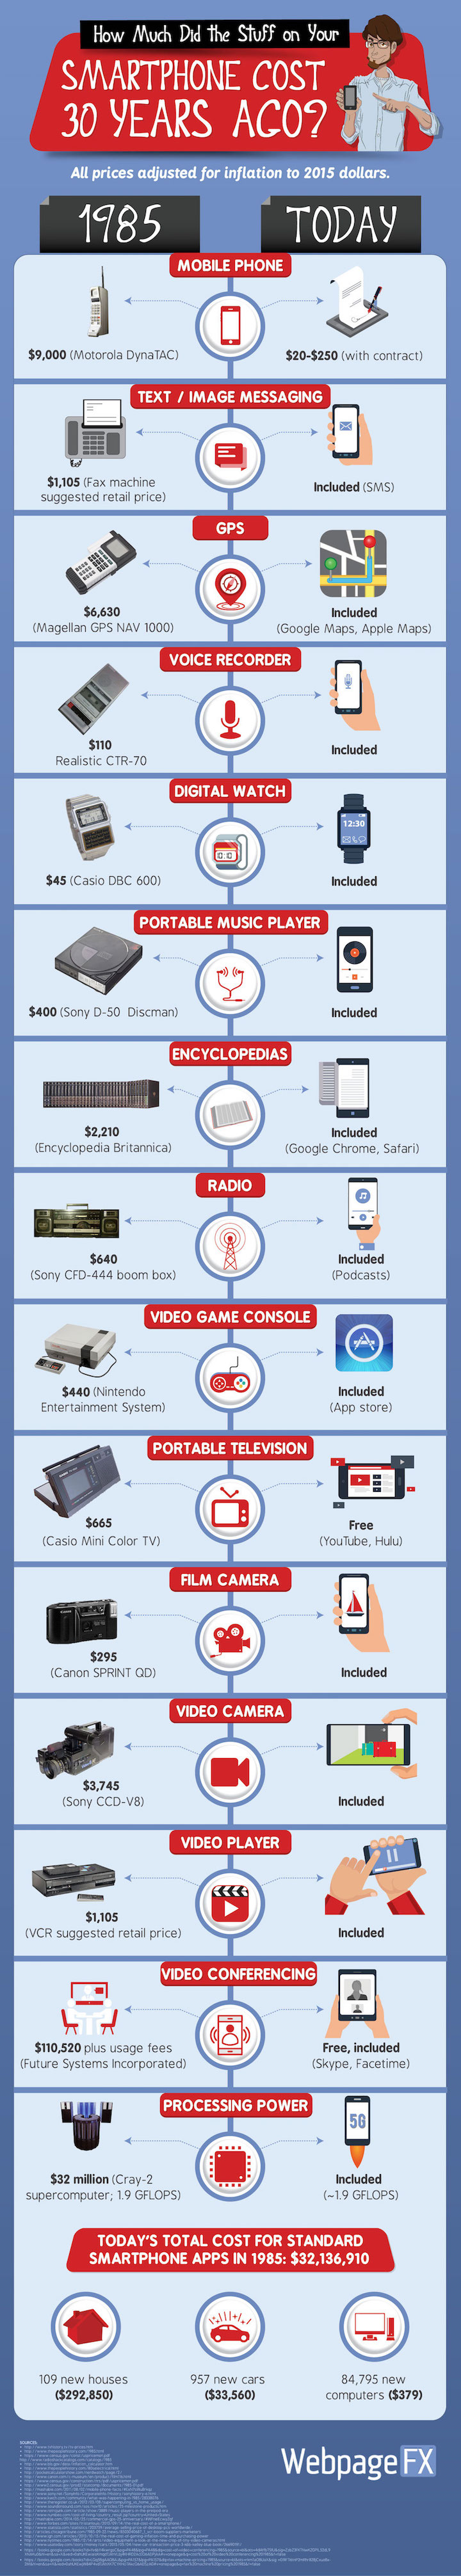 WebpageFX Smartphone Cost